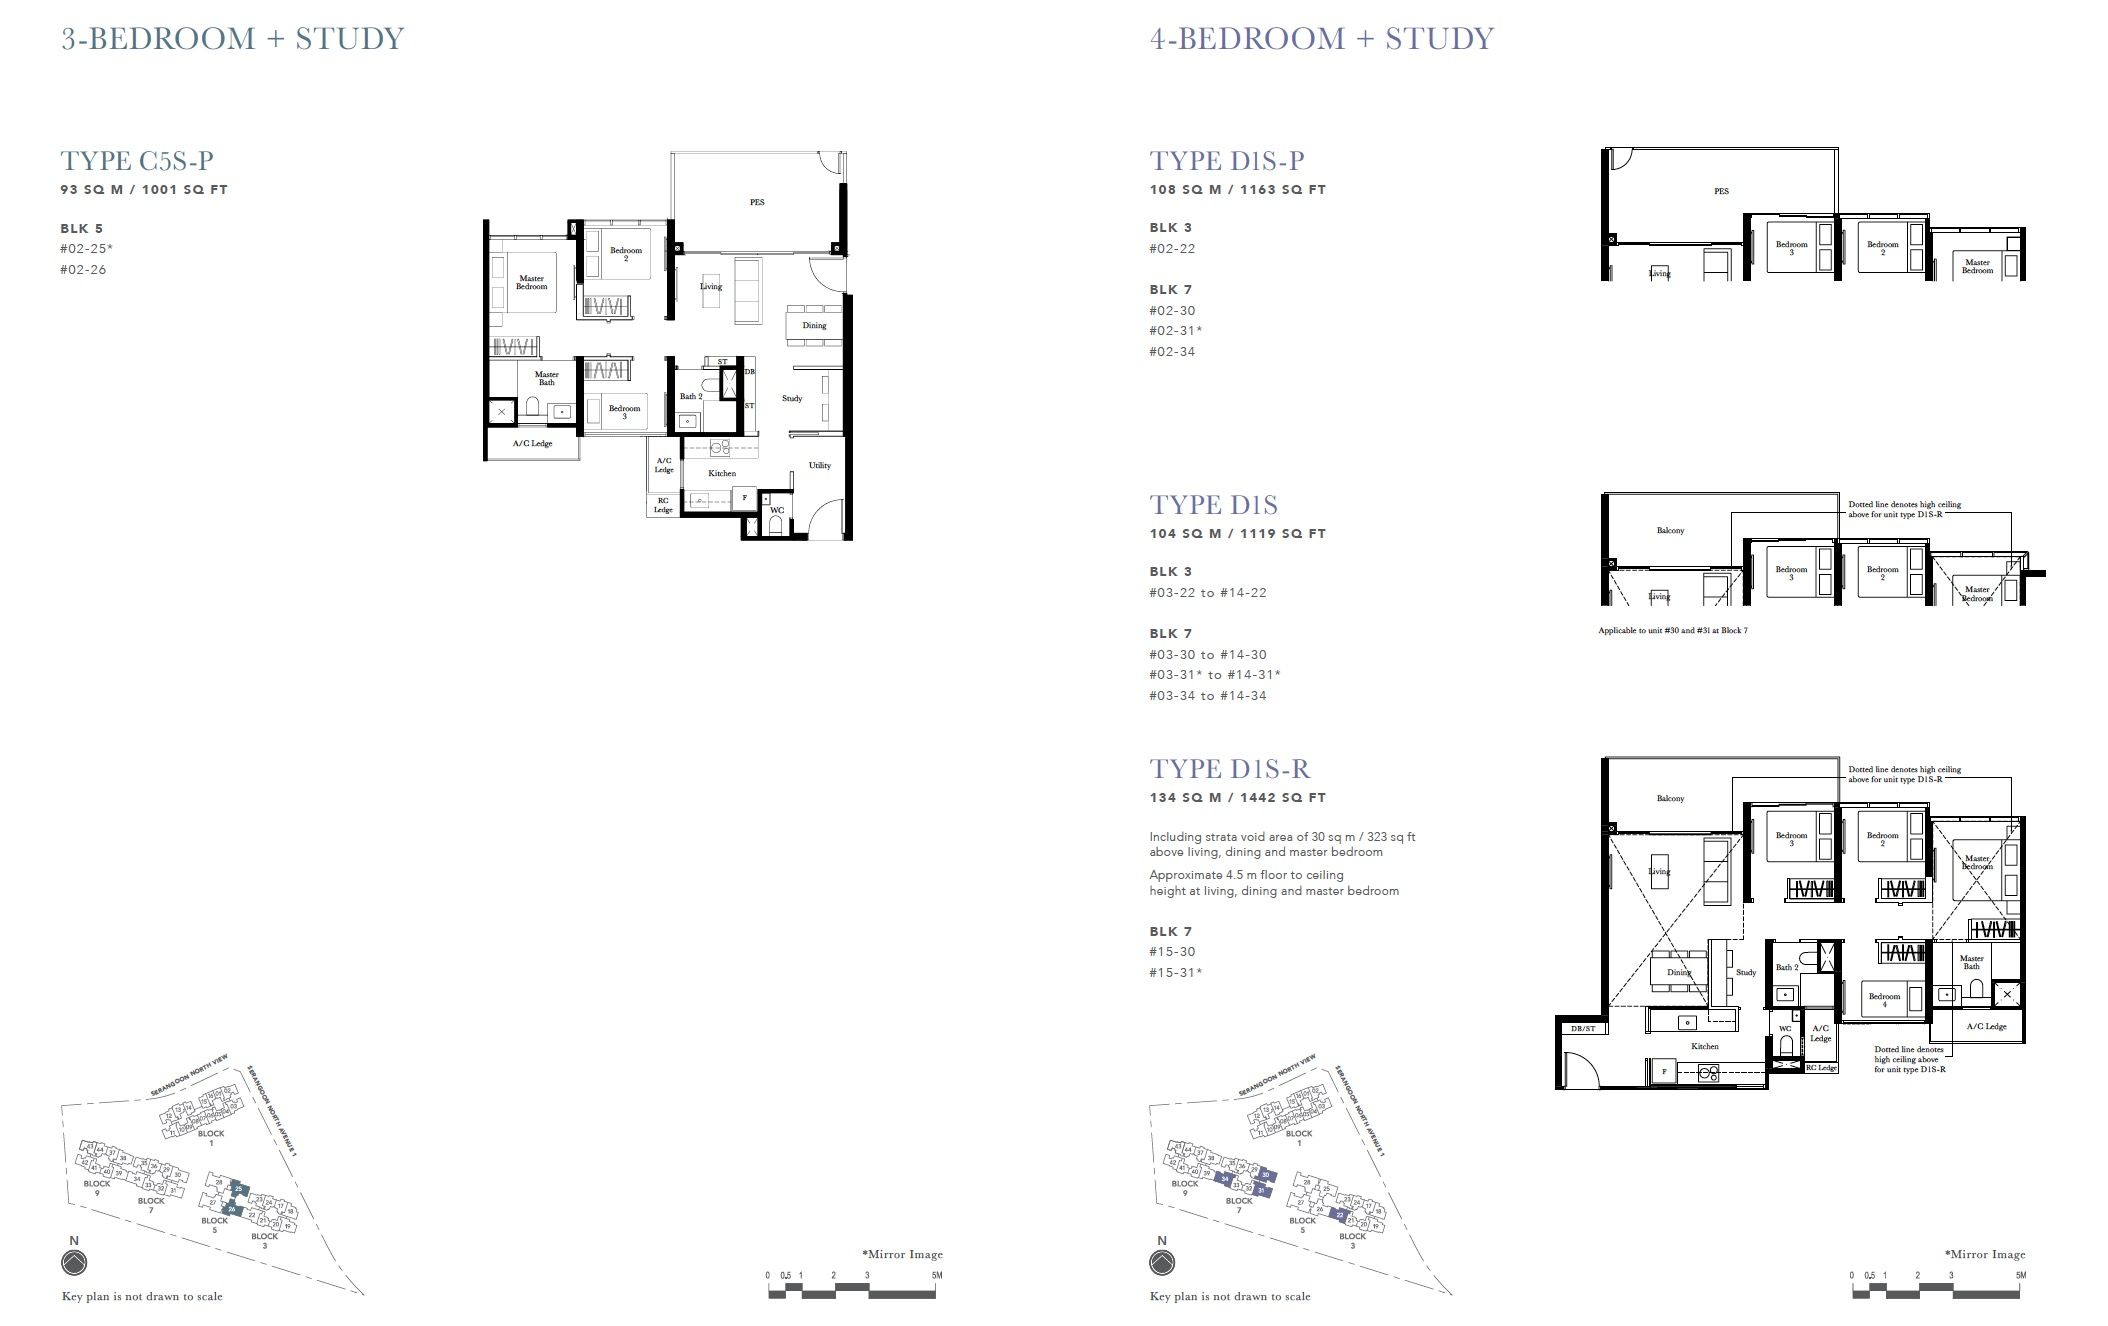 4br+S-the-garden-residences-floor-plan